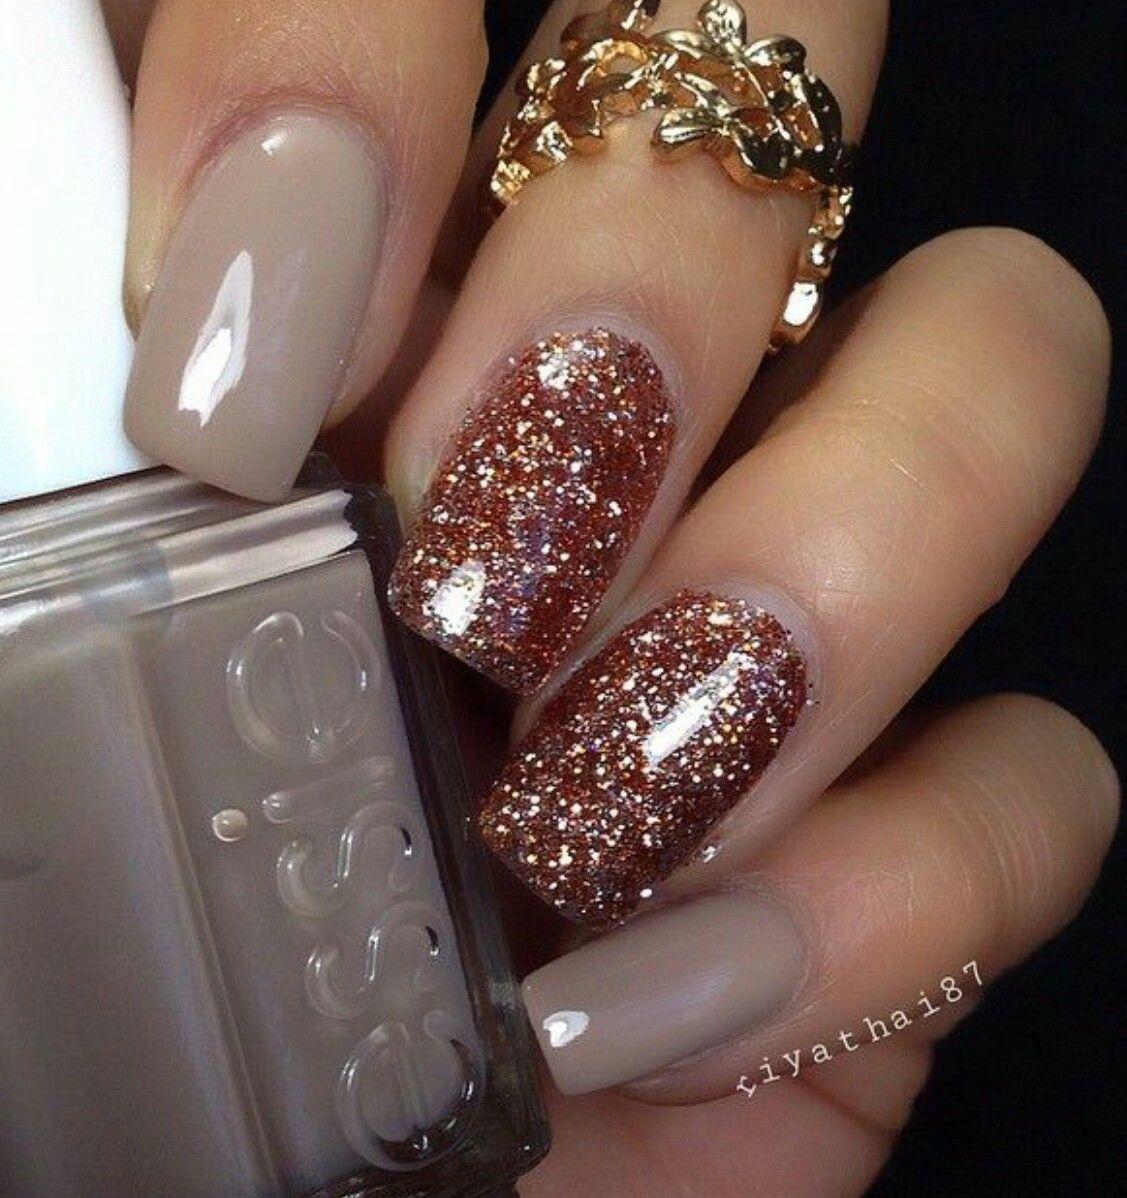 Pin by Lorene Davis on nails | Pinterest | Manicure, Makeup and Pedi